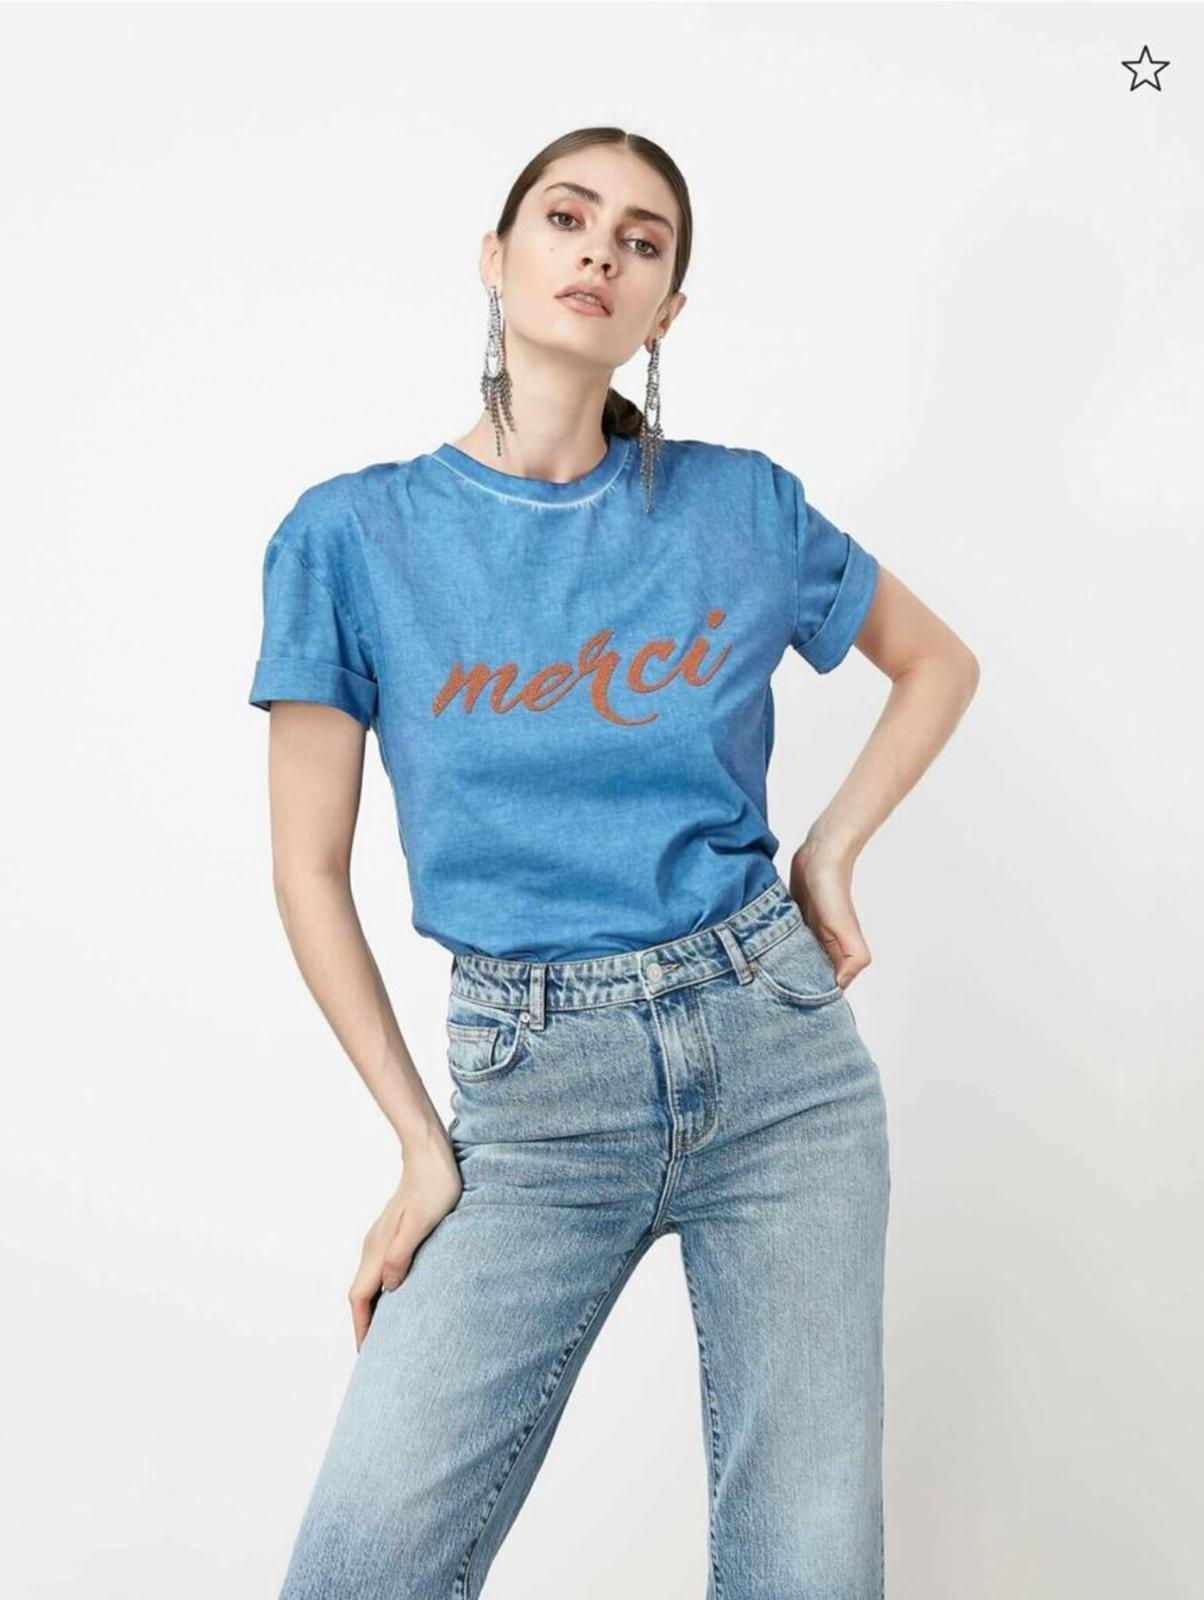 Piece paint and caviar print tshirt